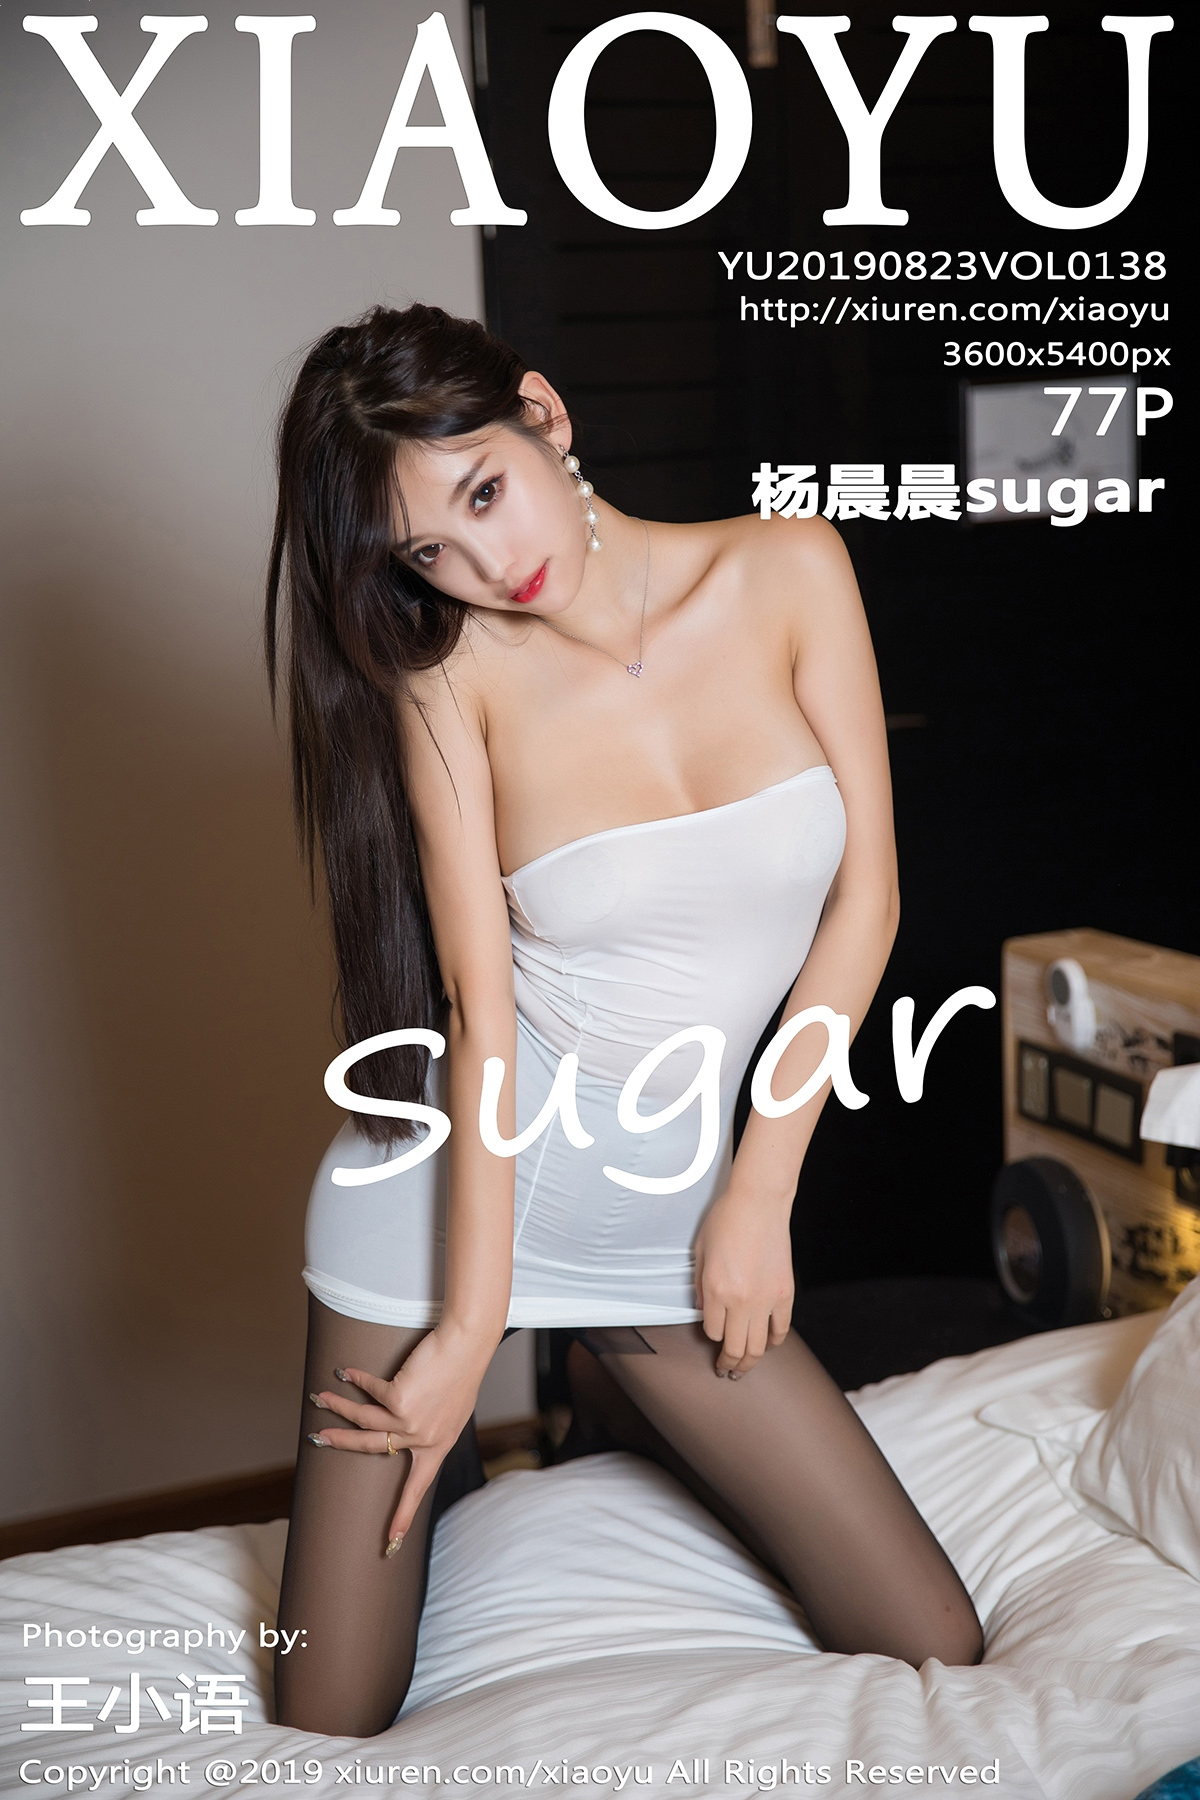 [XIAOYU语画界]2019.08.23 VOL.138 杨晨晨sugar 黑丝 美腿[/299MB]